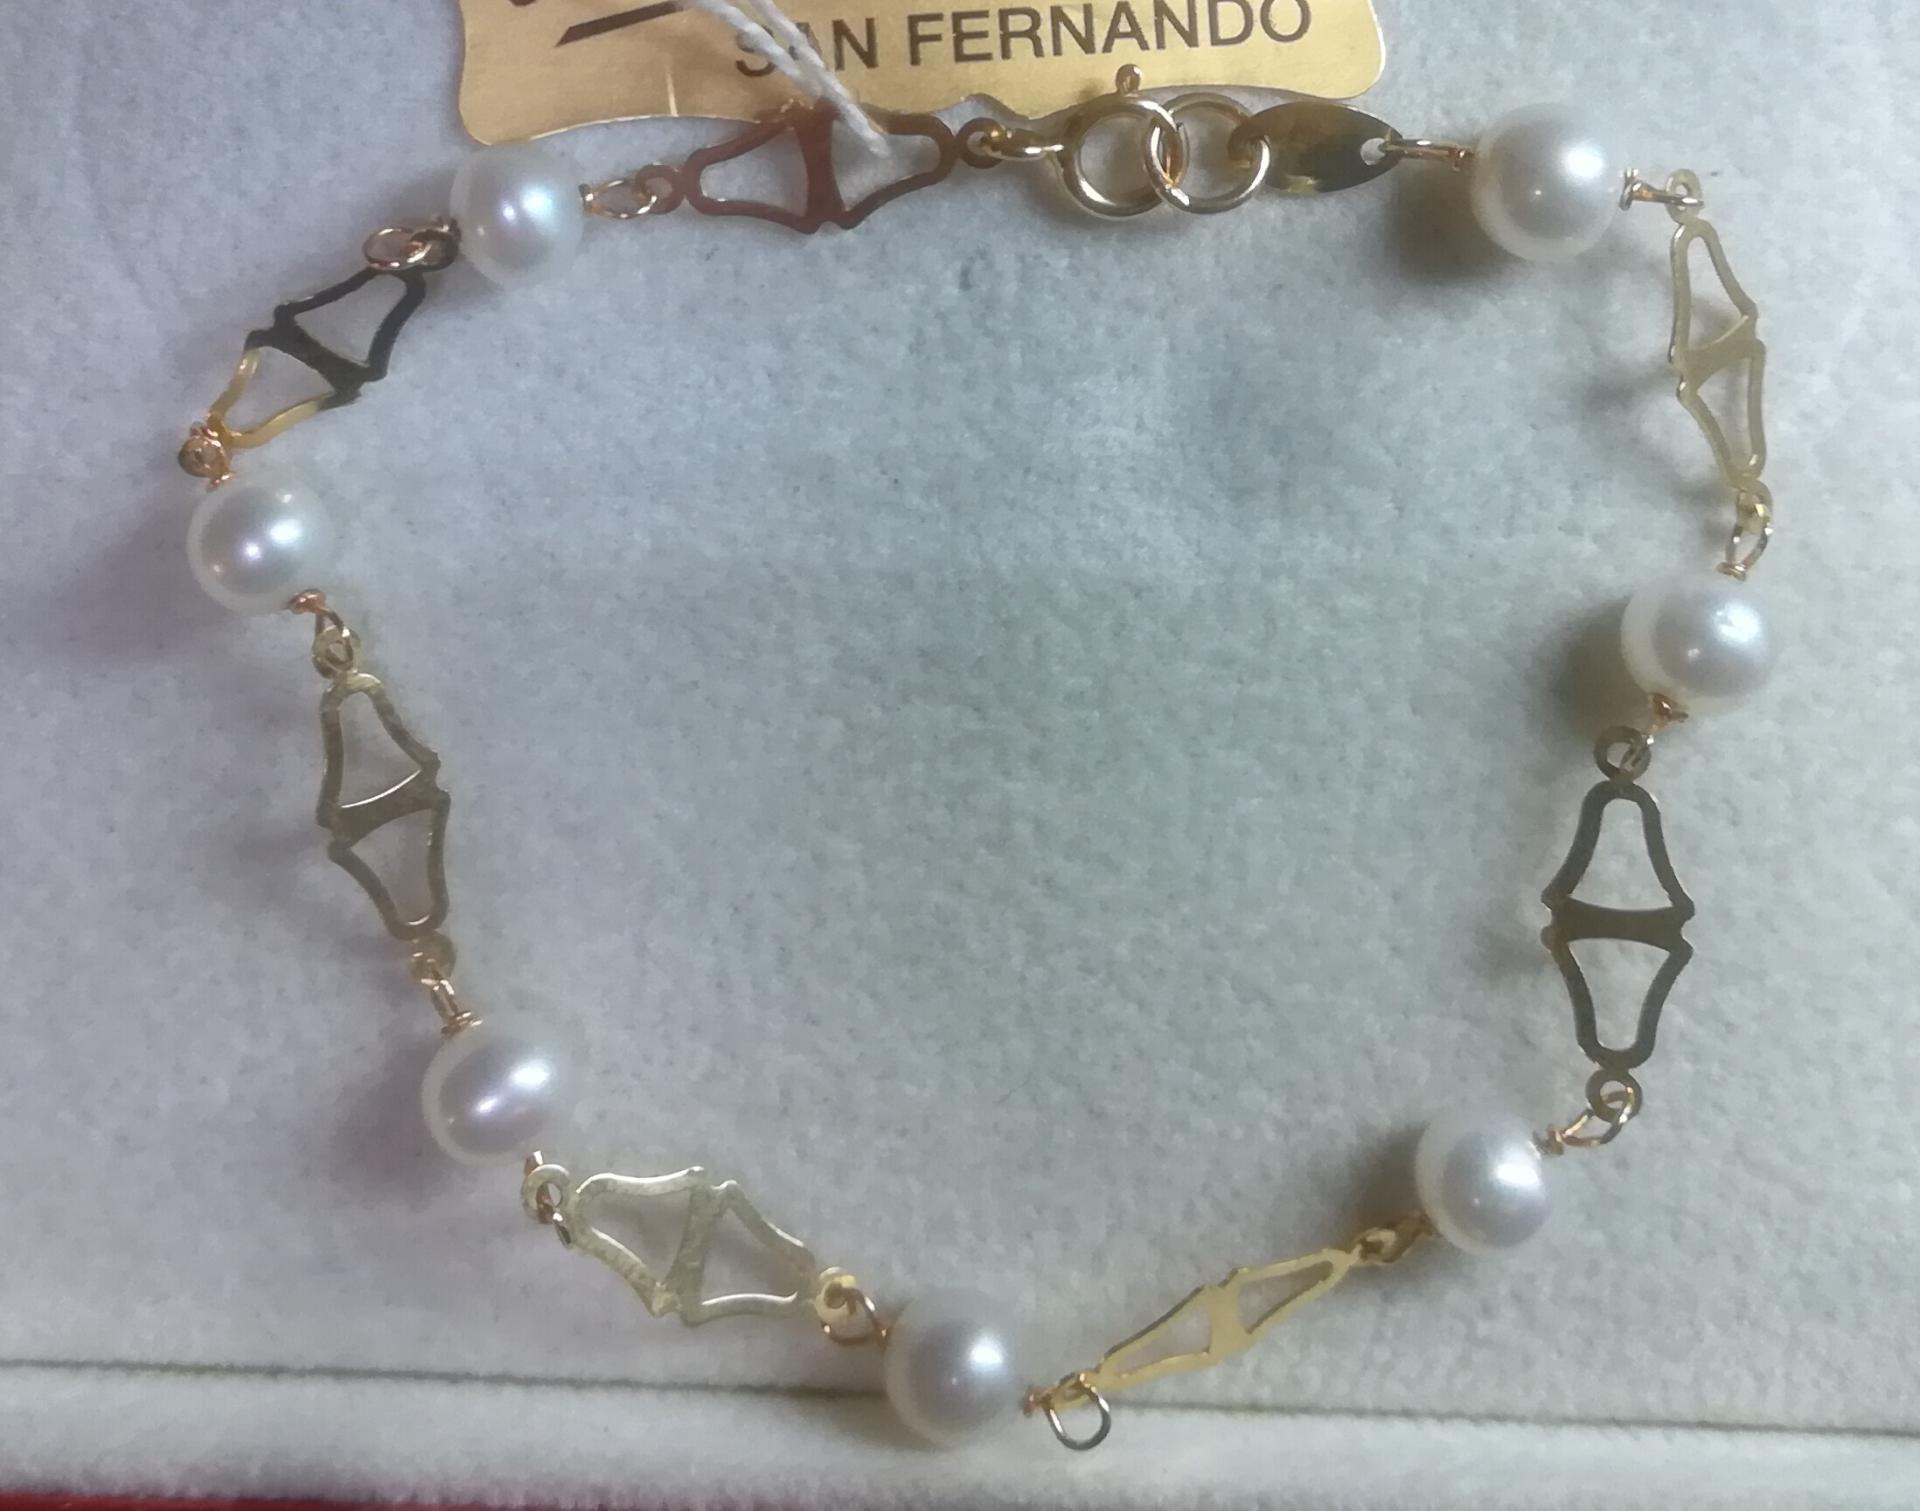 Bonita Pulsera para Niña Primera Comunión Fabricada en Oro Con Perlas Cultivadas